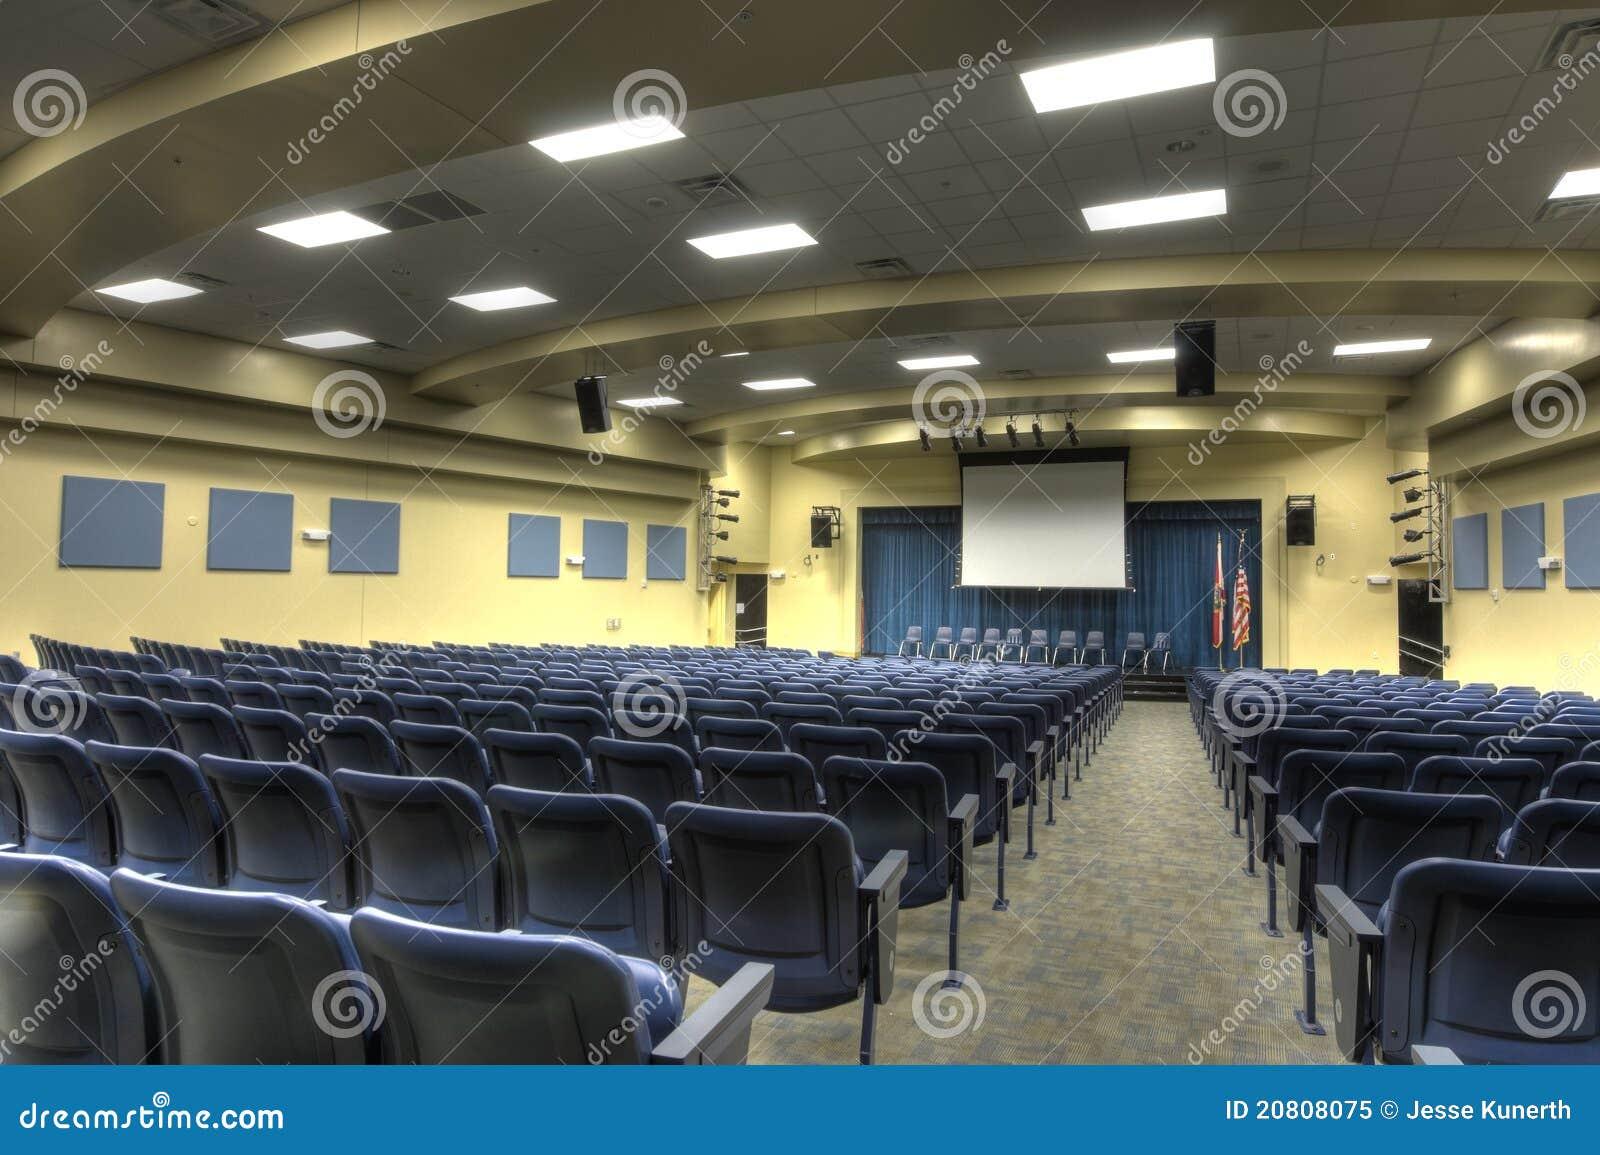 HDR Of Auditorium Royalty Free Stock Photo - Image: 20808075